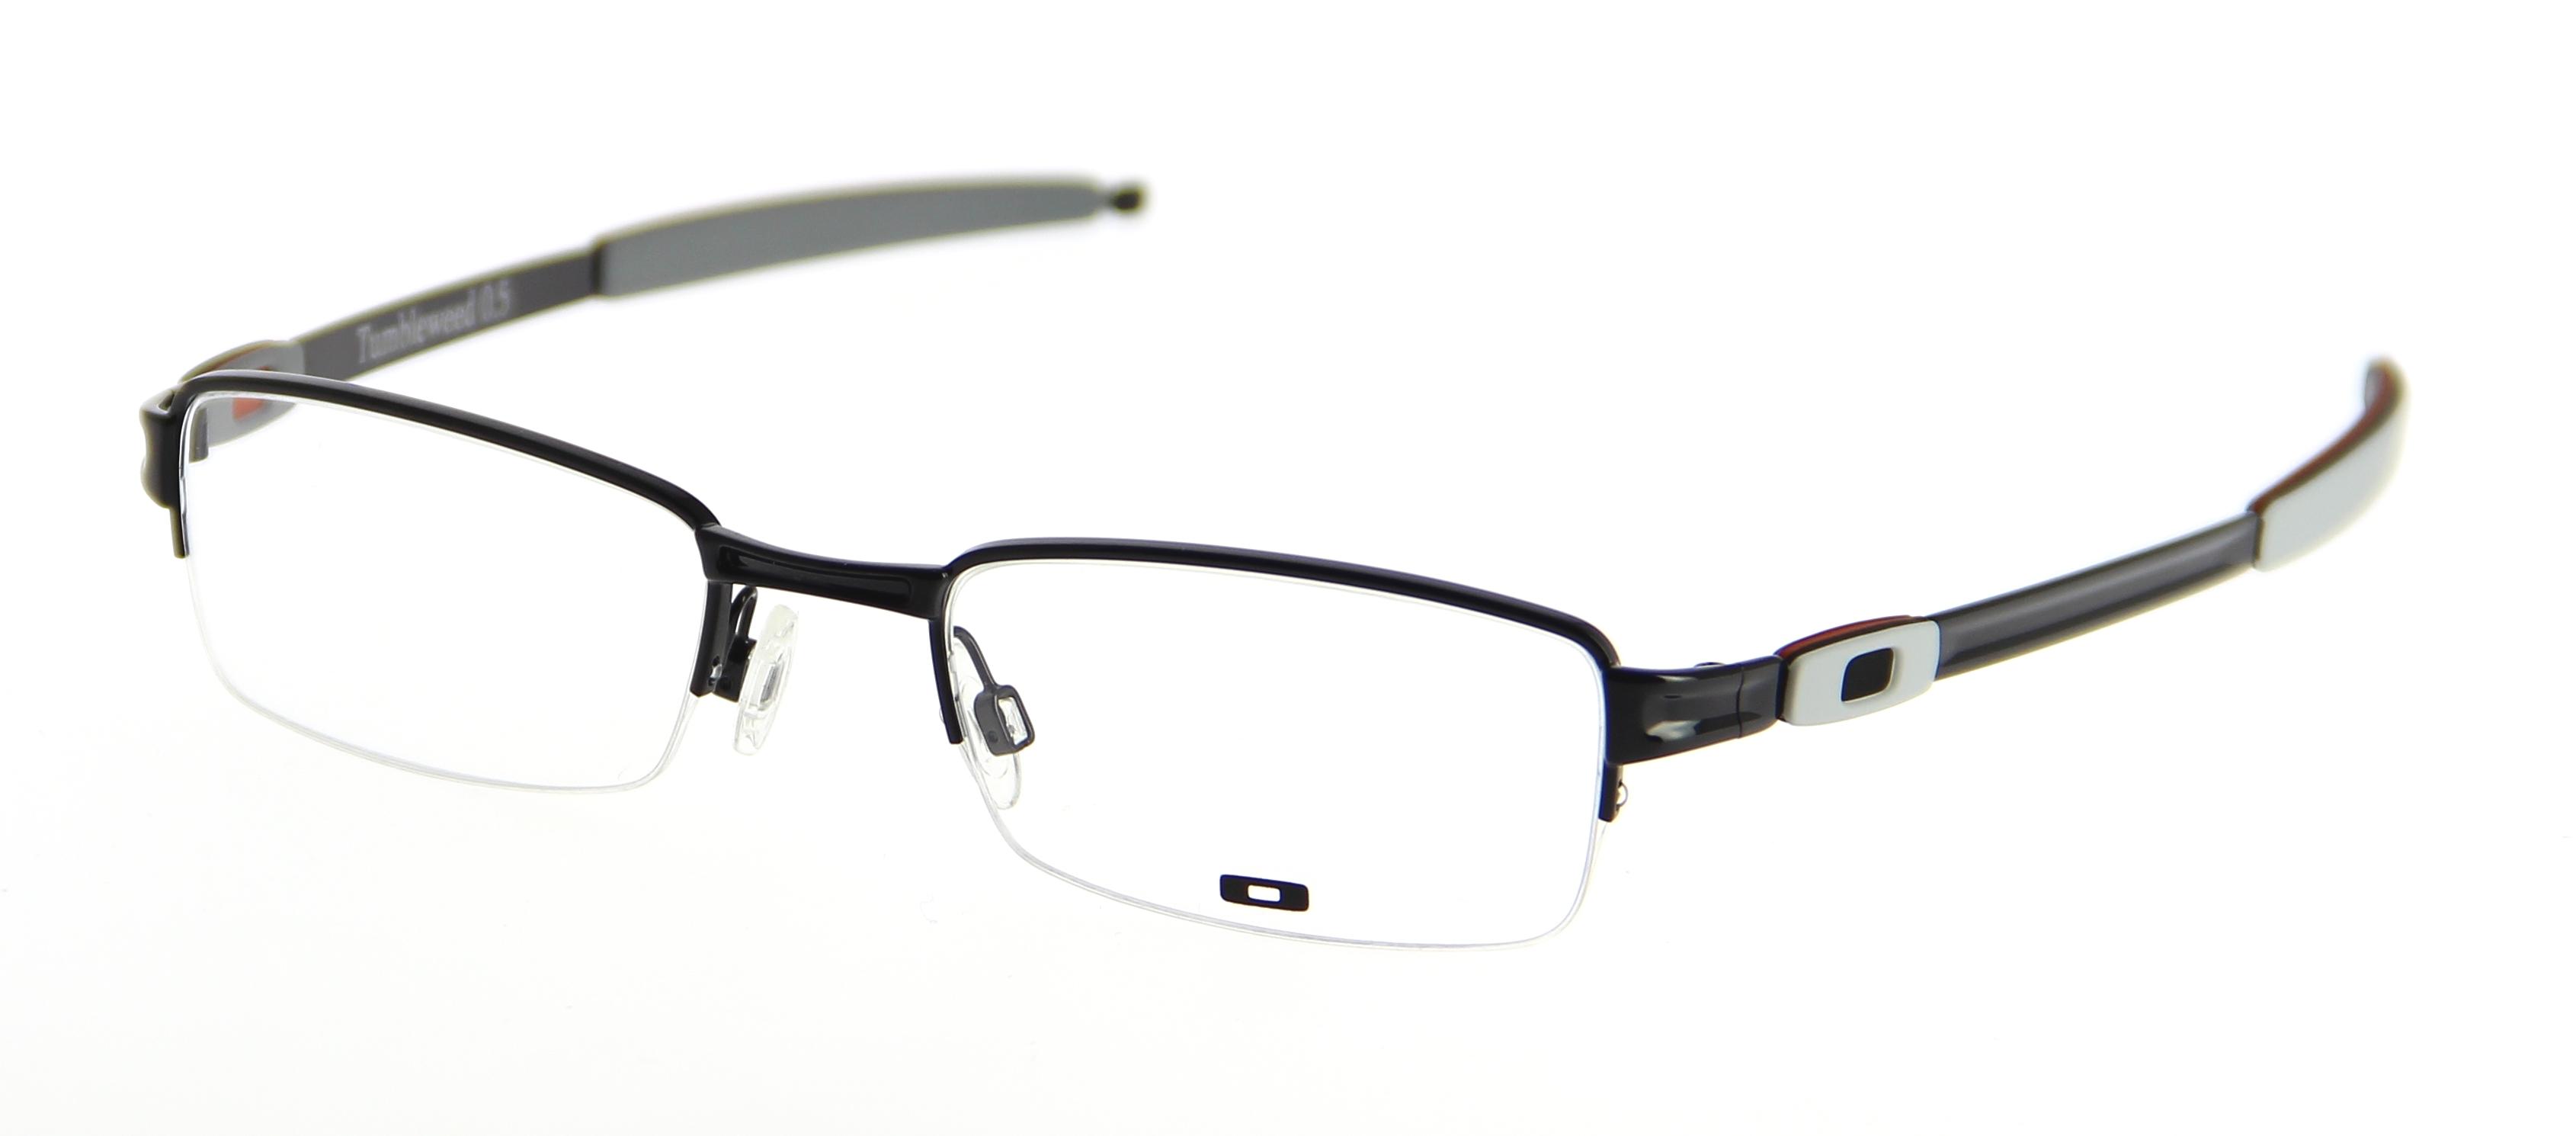 546304994e4 Oakley Evade Titanium Eyeglass Frames - Bitterroot Public Library